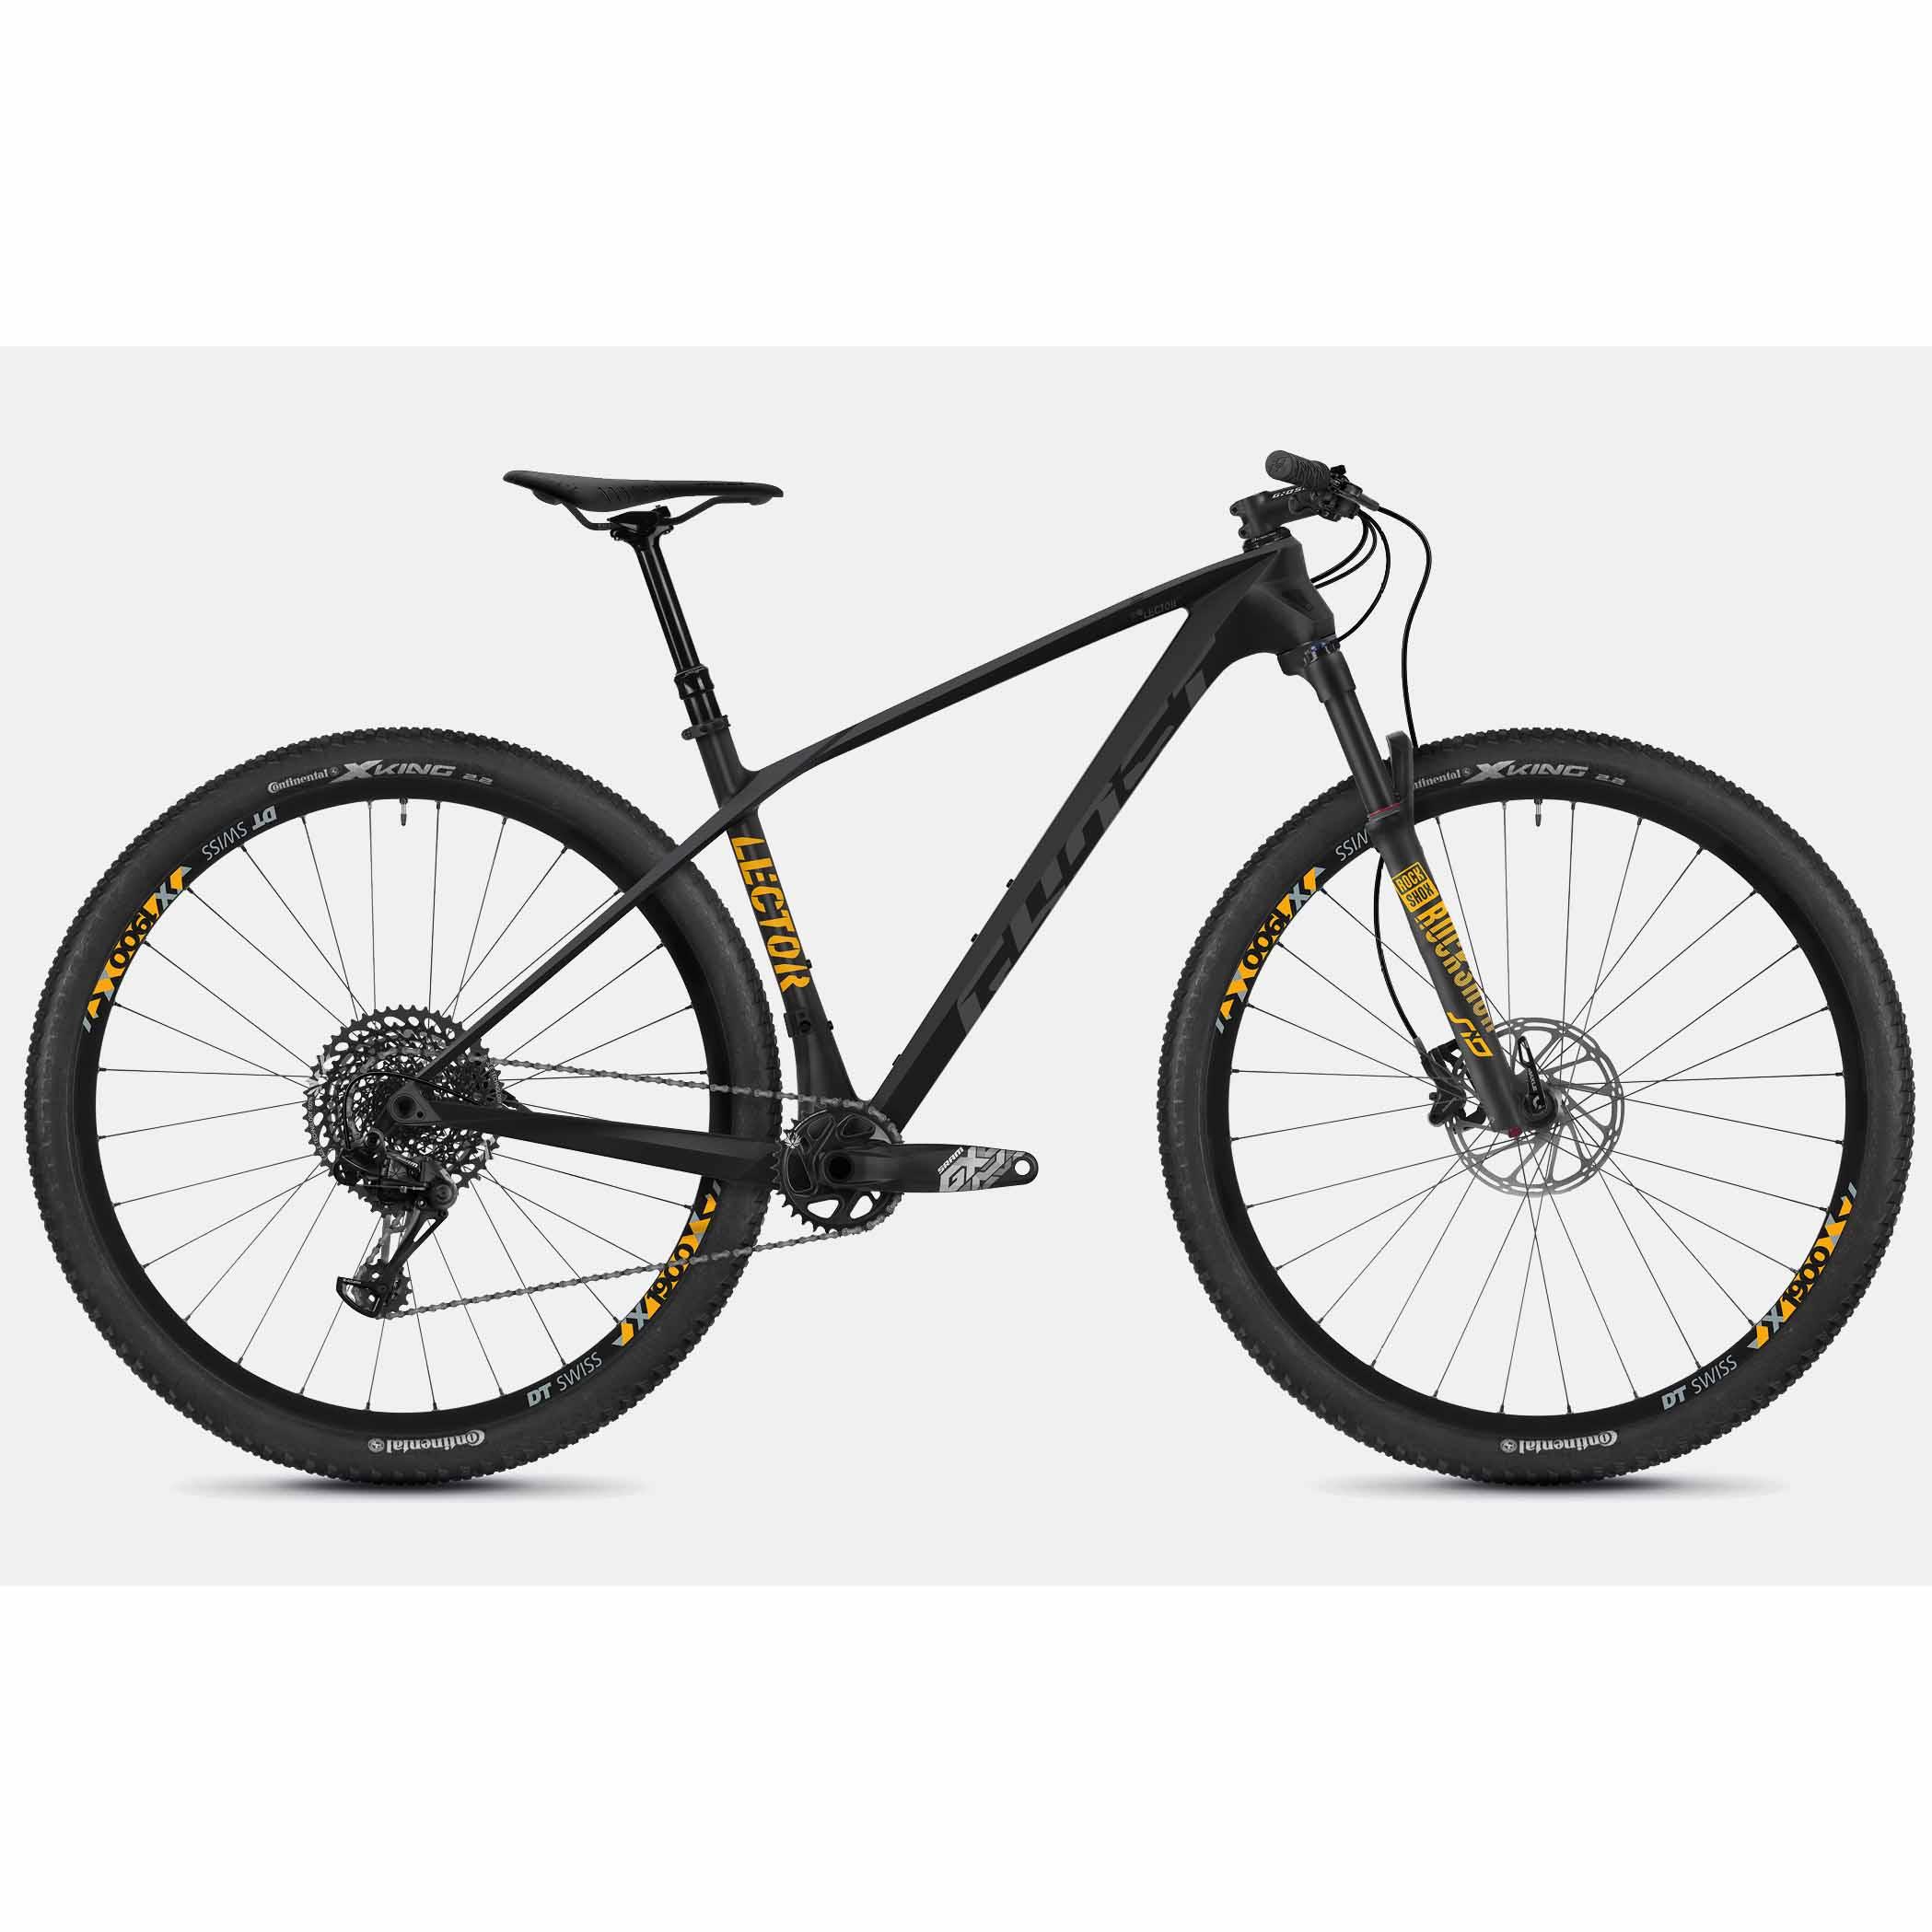 Фото Велосипед Ghost Lector 5.9 29″ , карбон,  рама M, черно-серо-желтый,  2019